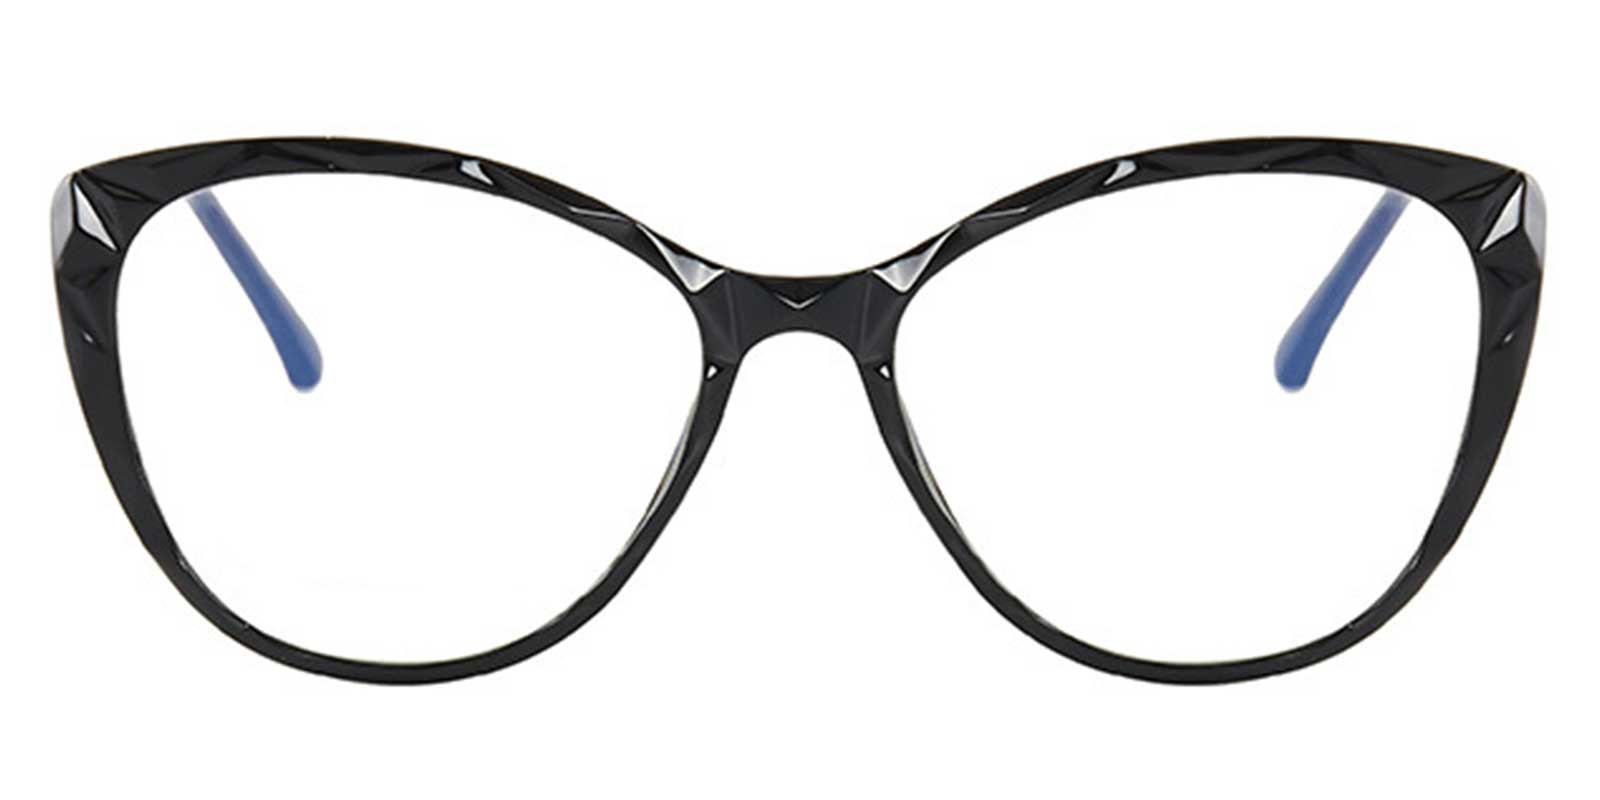 Januaria-Womens Cat Eye Glasses Four Colors